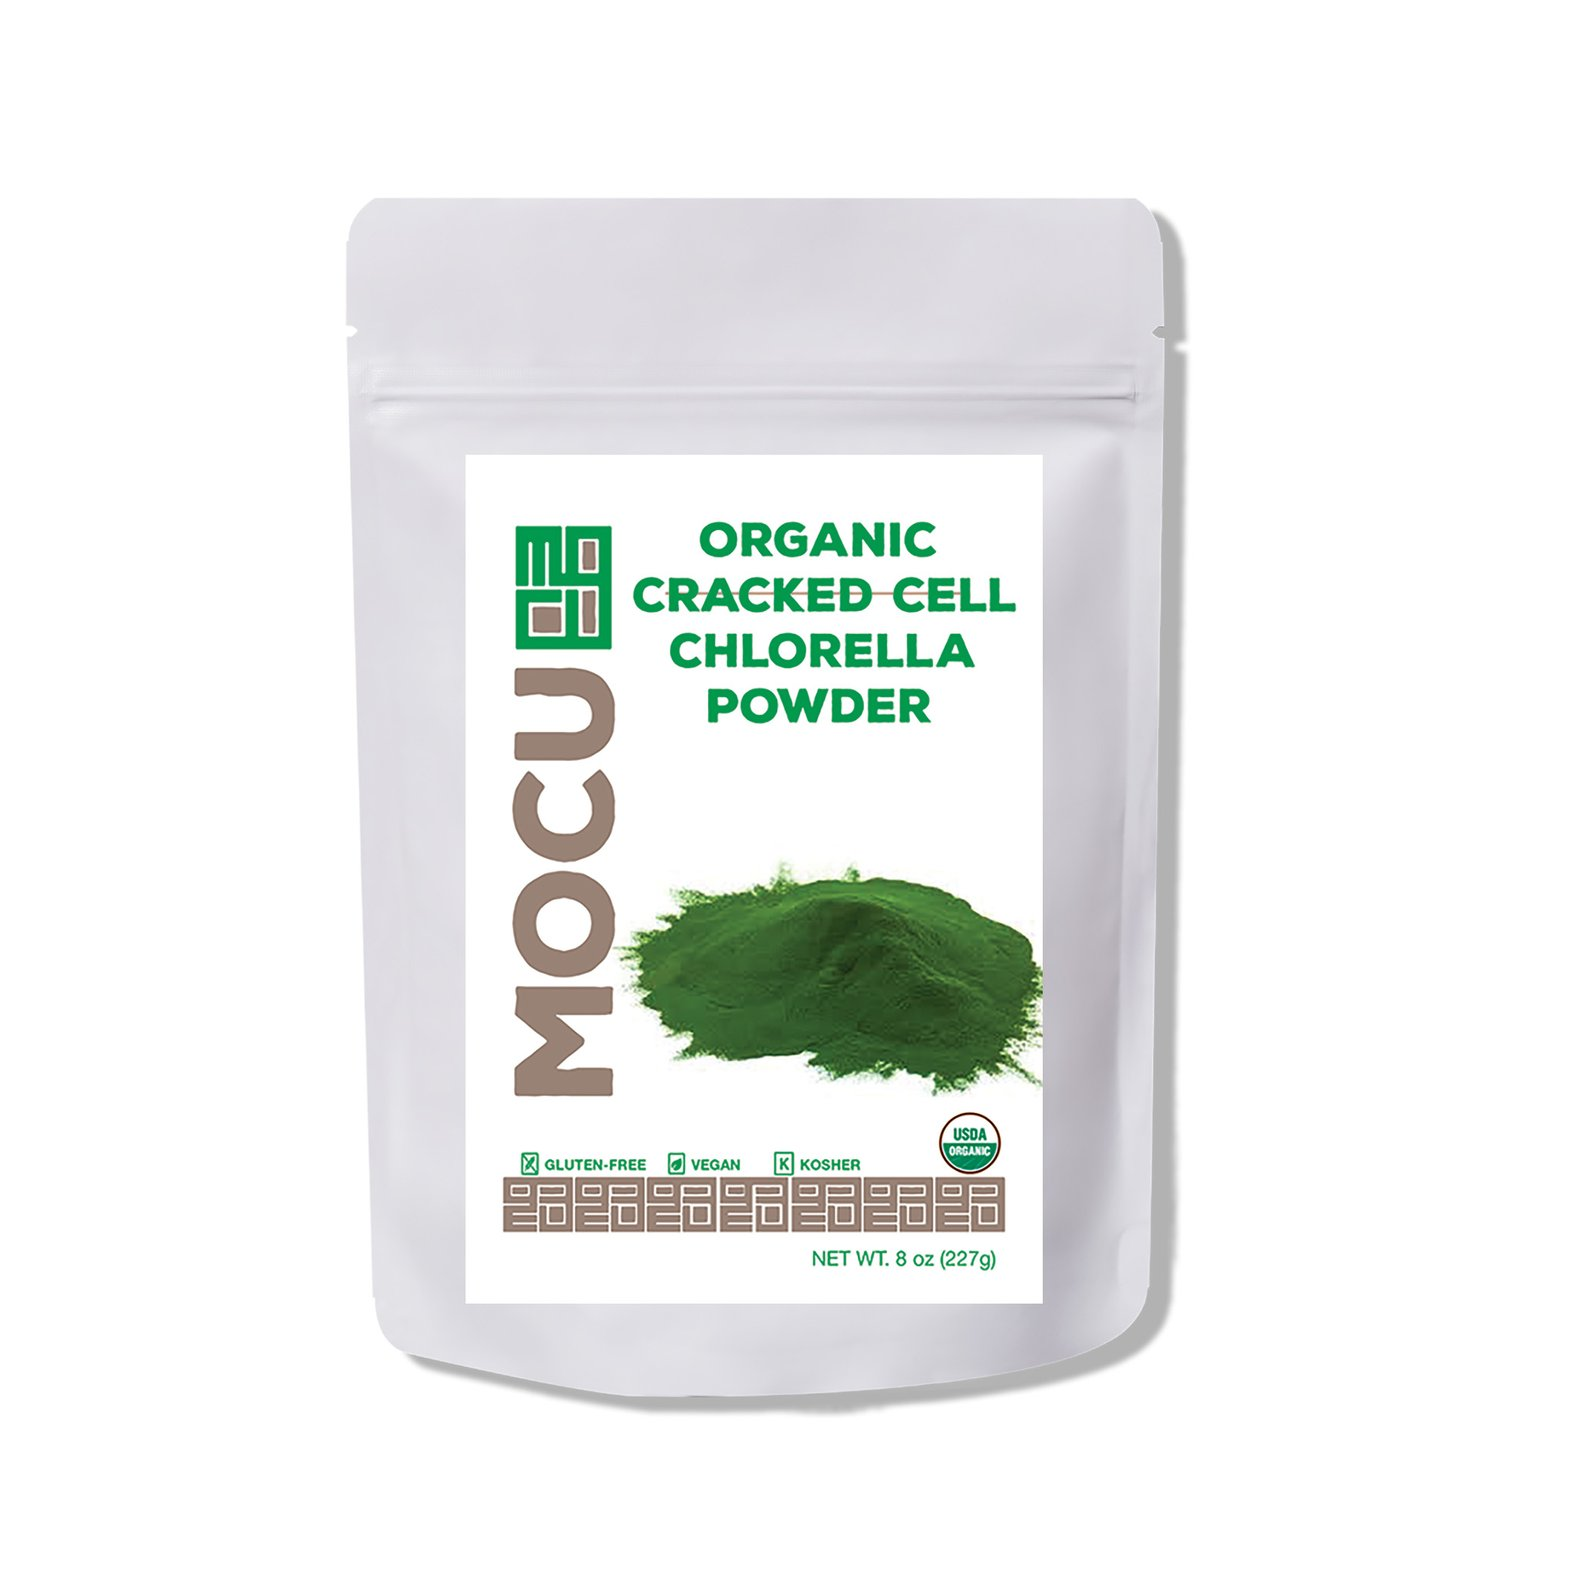 mocu-organic-cracked-cell-chlorella-powder-front.jpg